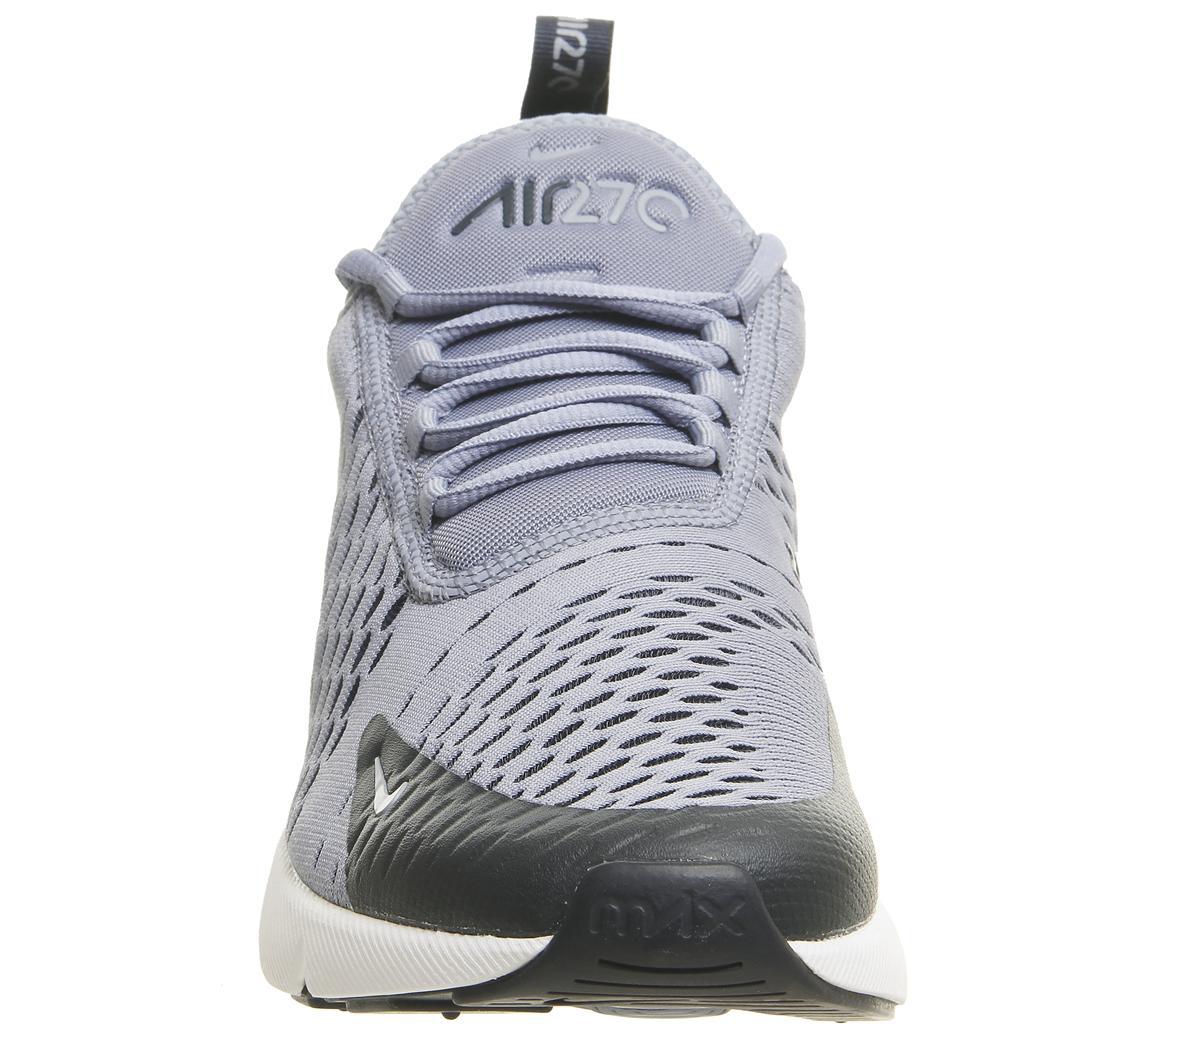 Nike Air Max 270 Ashen Slate His trainers